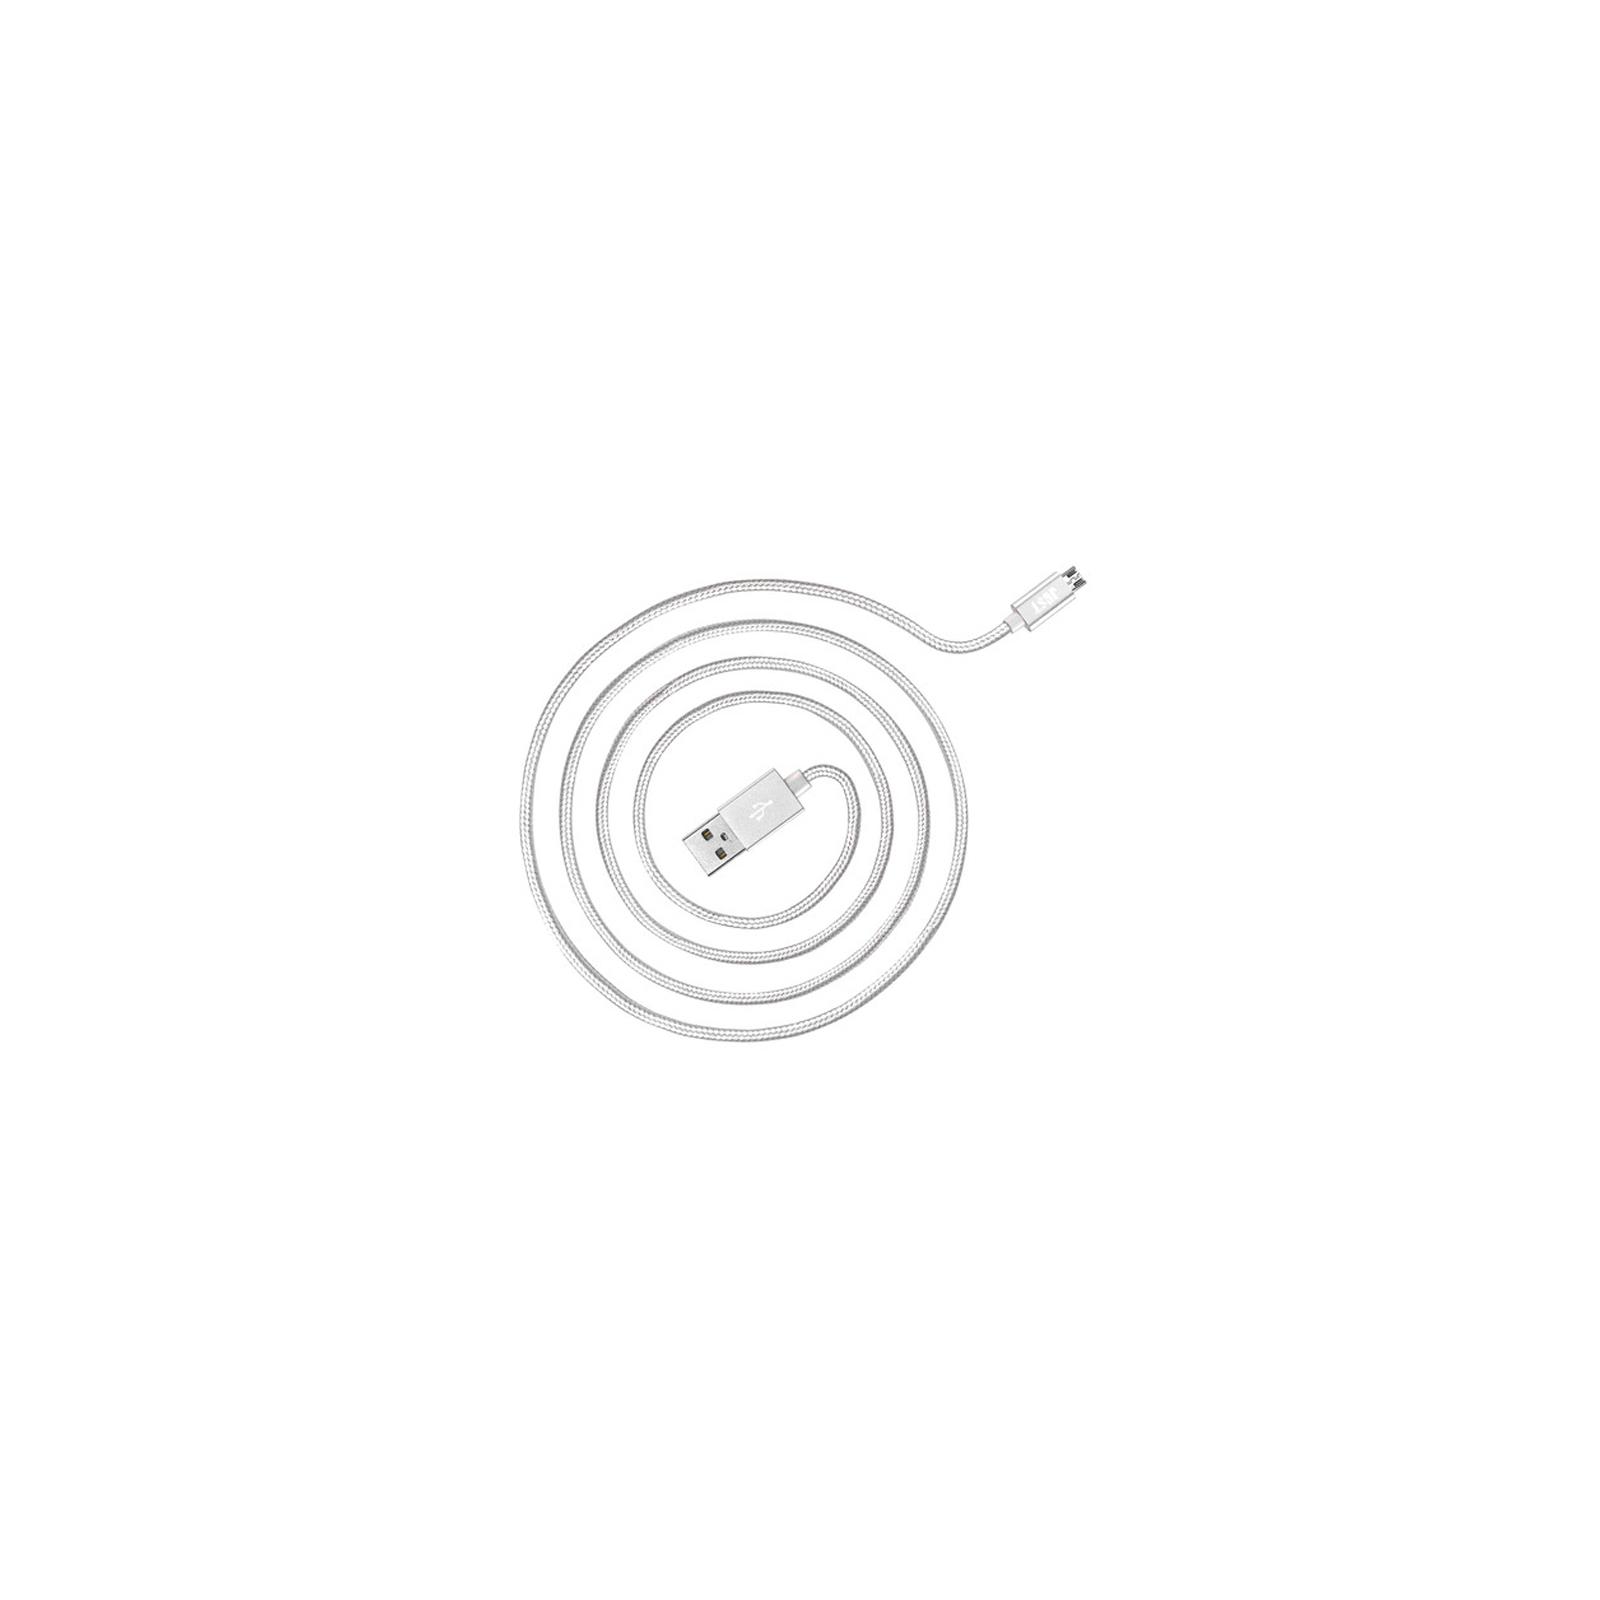 Дата кабель JUST Copper Micro USB Cable 2M Silver (MCR-CPR2-SLVR) изображение 2